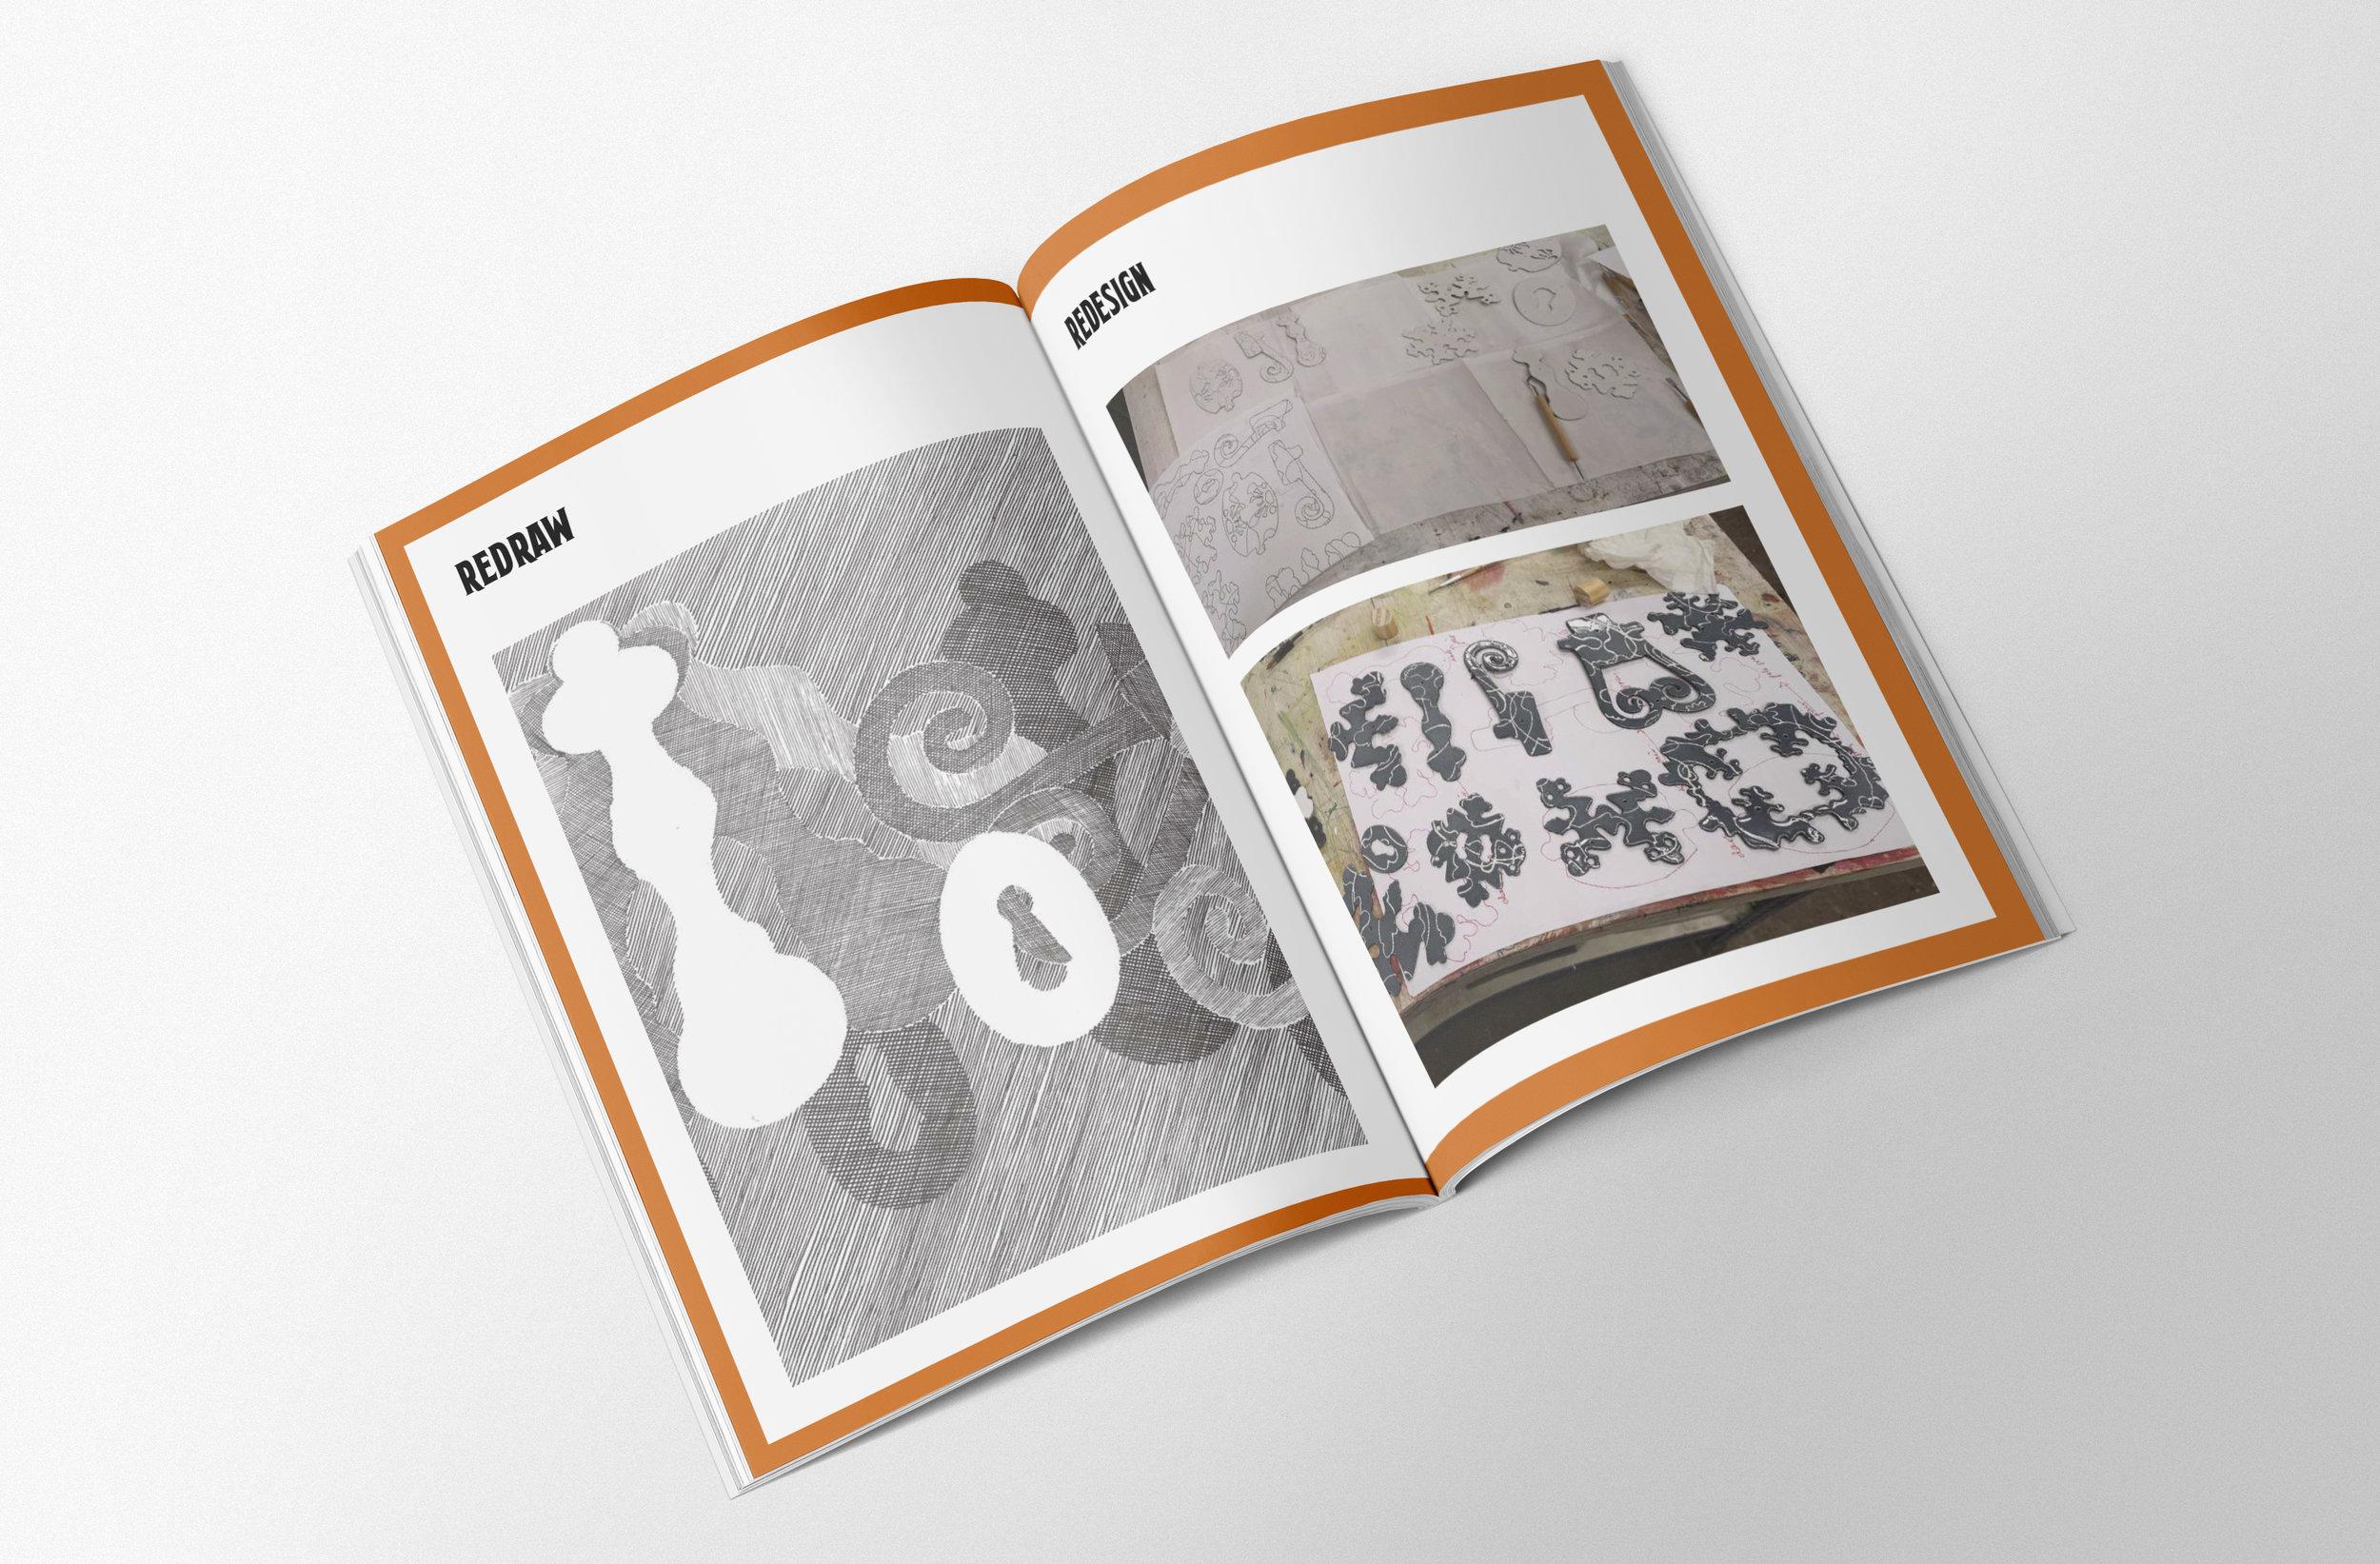 169-magazine-mockup-02-3.jpg